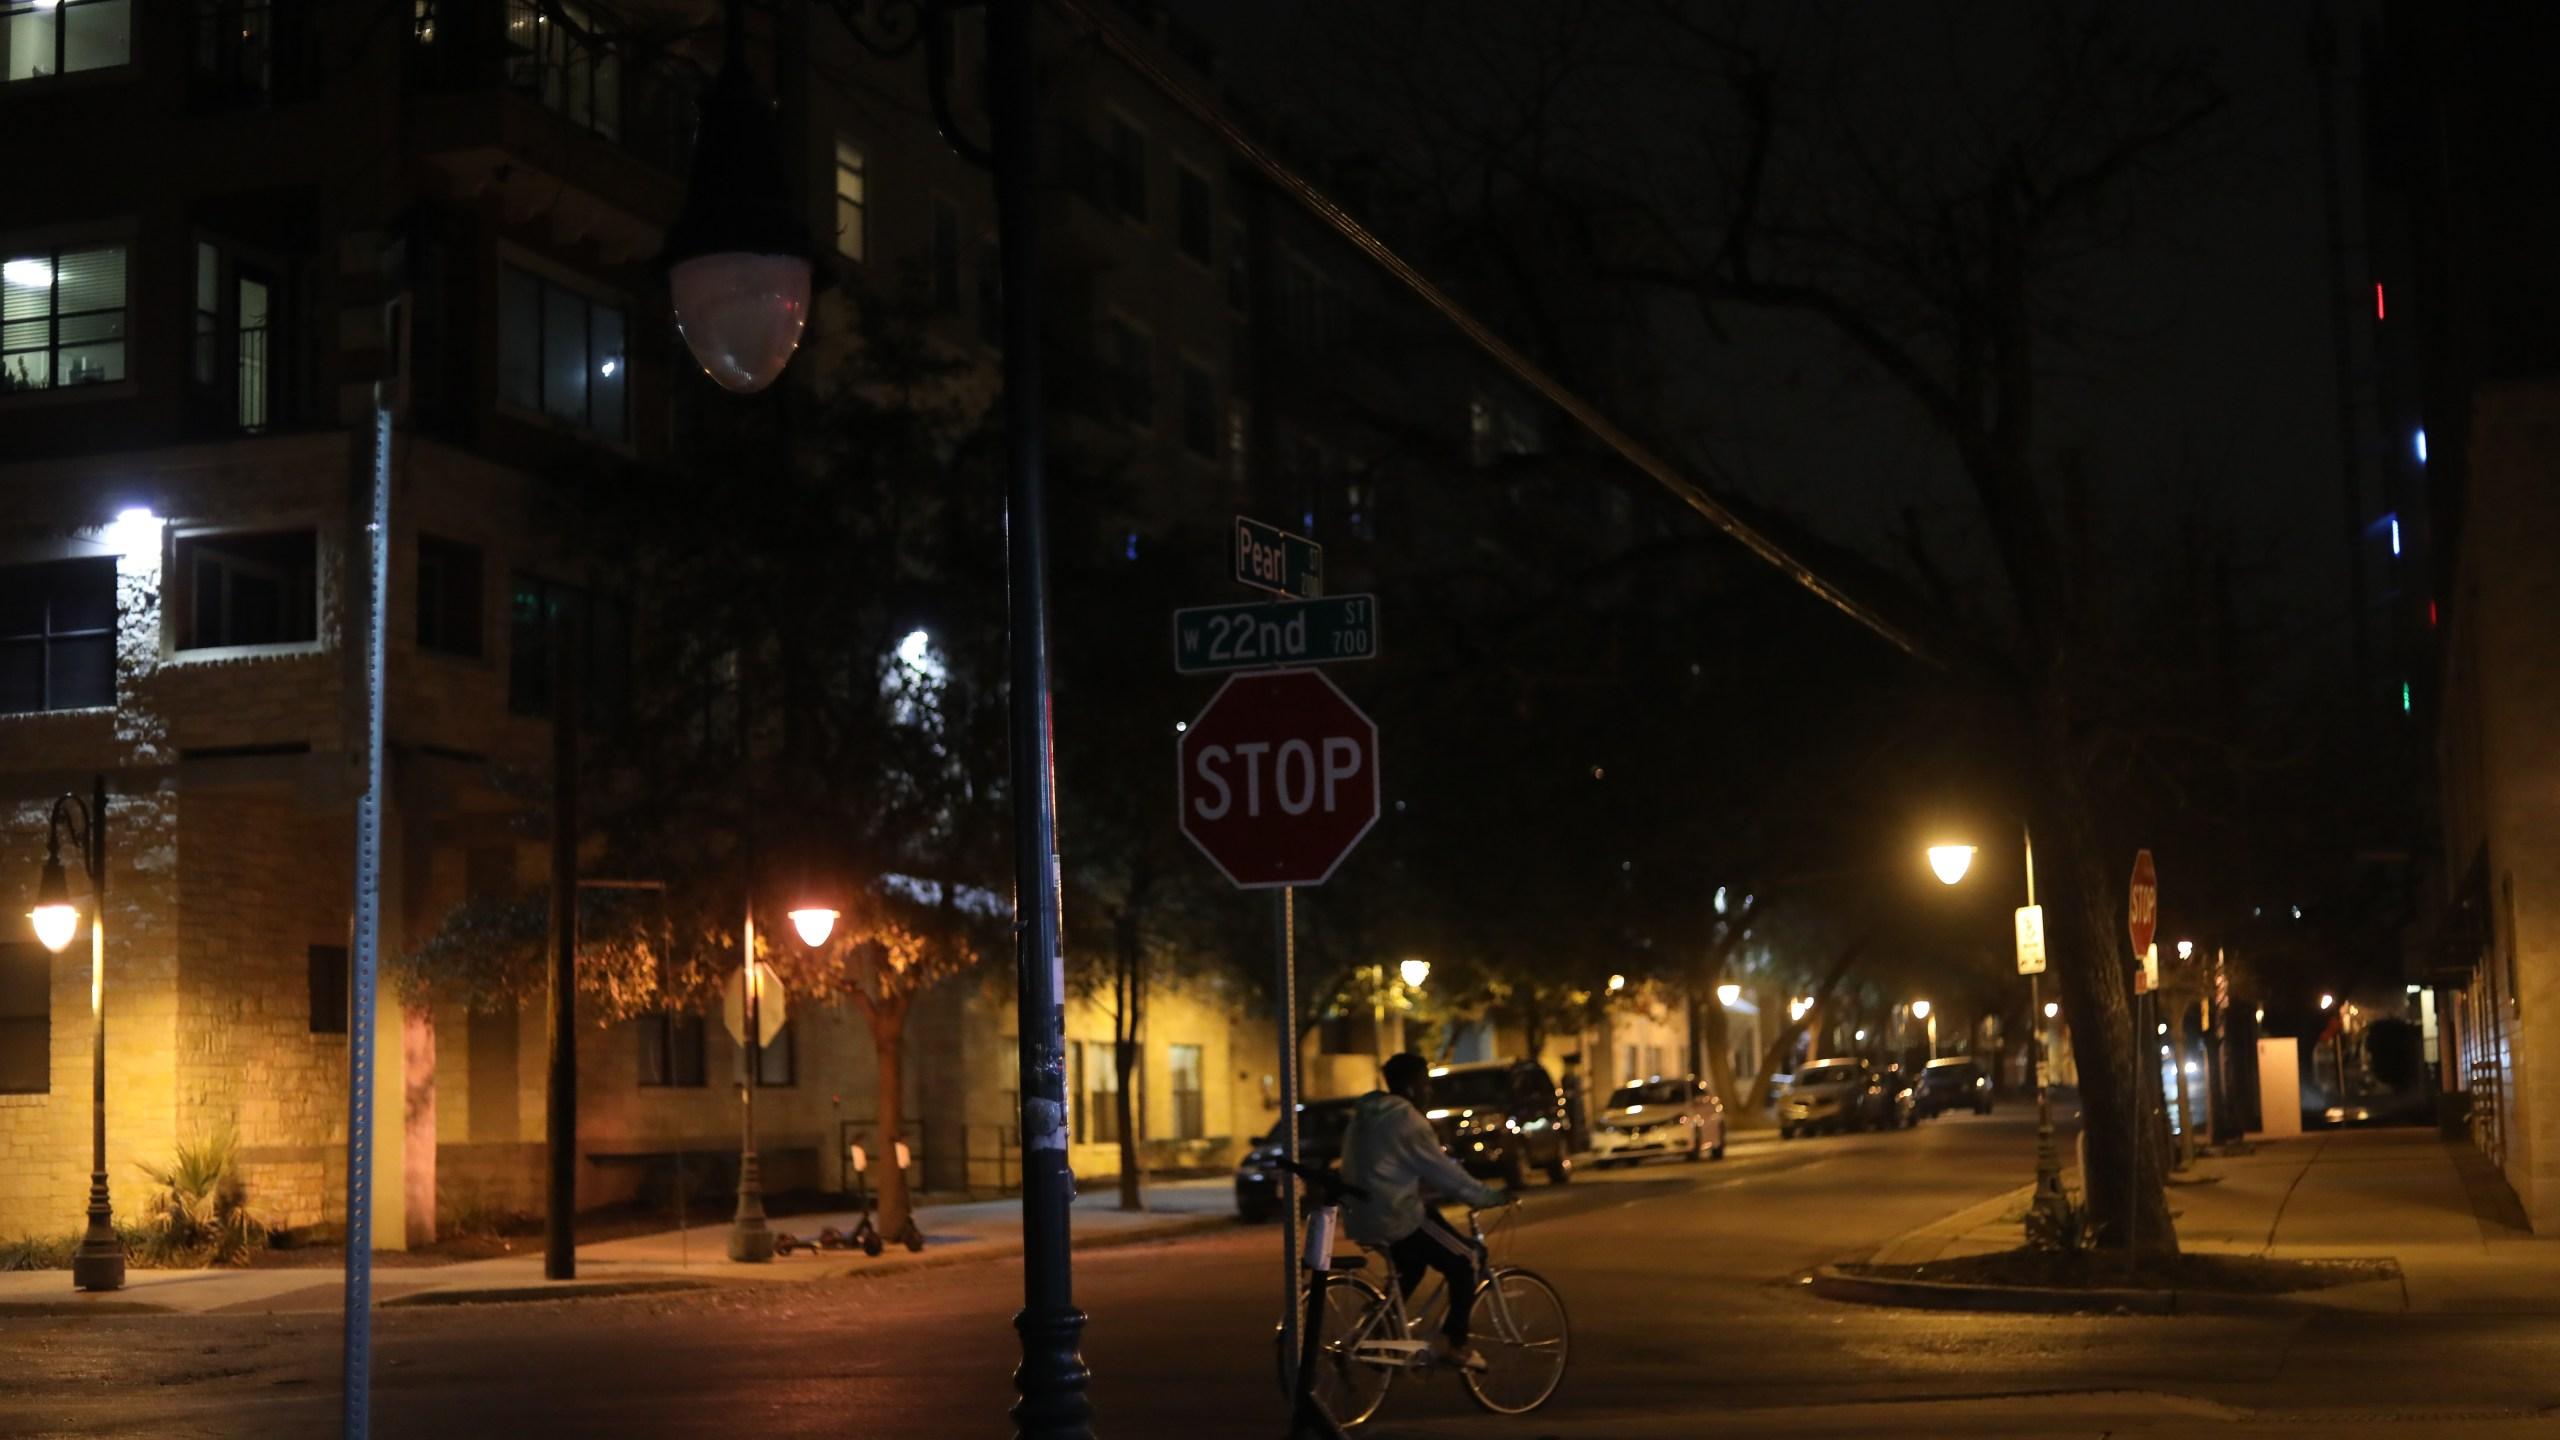 Broken street light in West Campus (Photo: Ashley Miznazi)